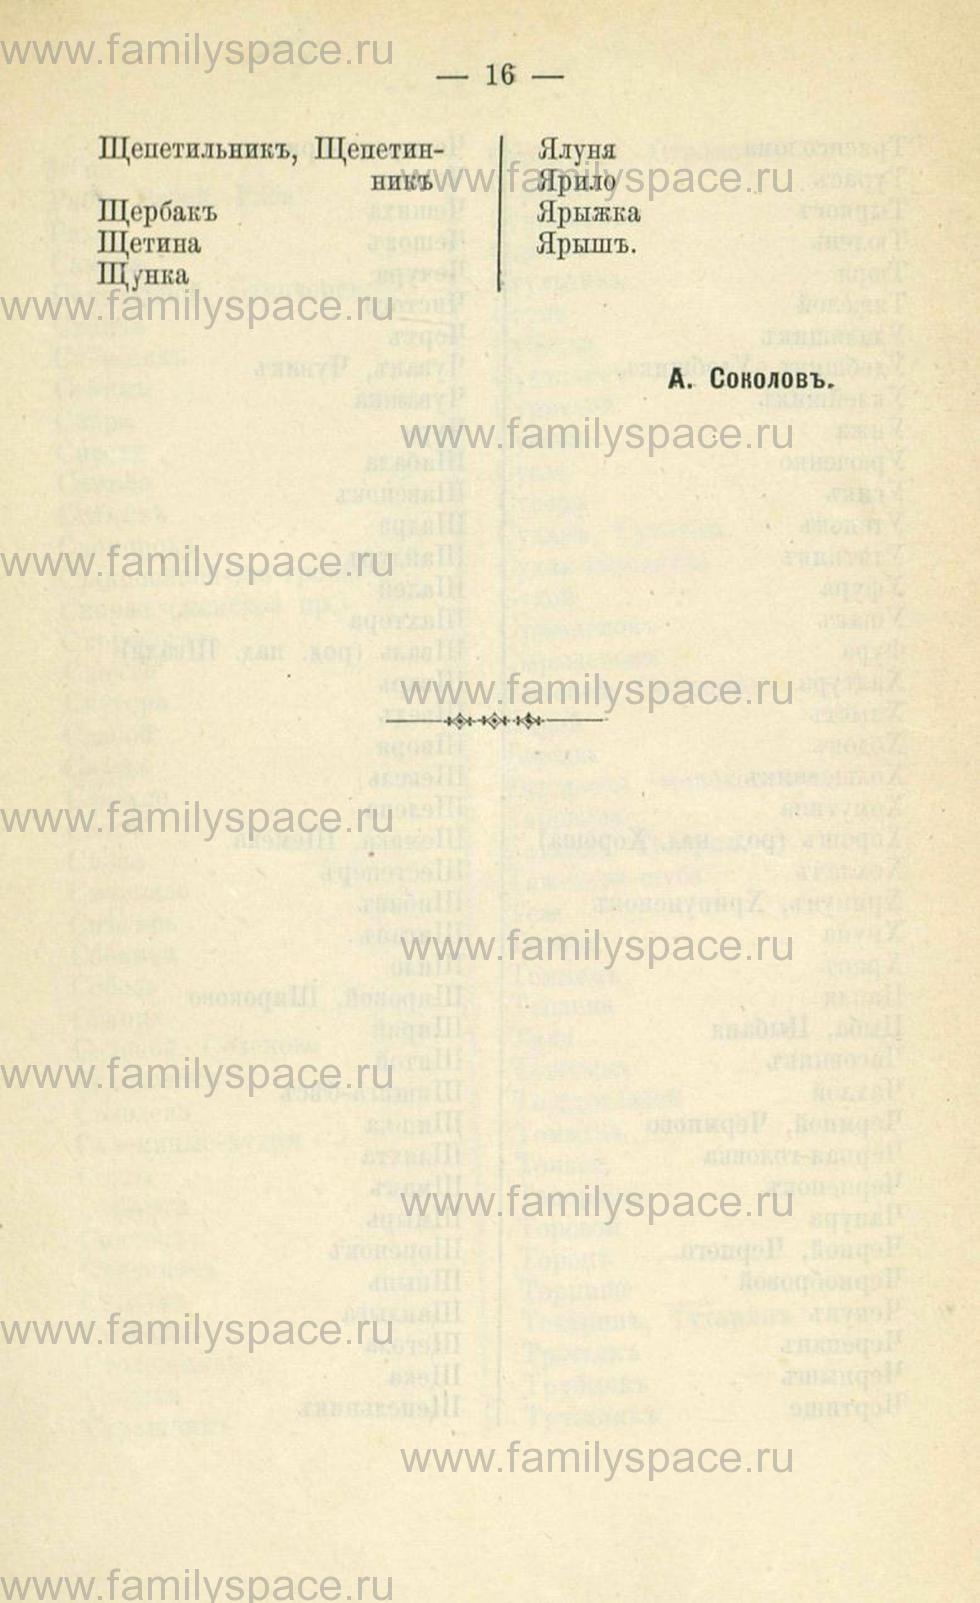 Поиск по фамилии - Русские имена и прозвища в 17 веке, страница 19